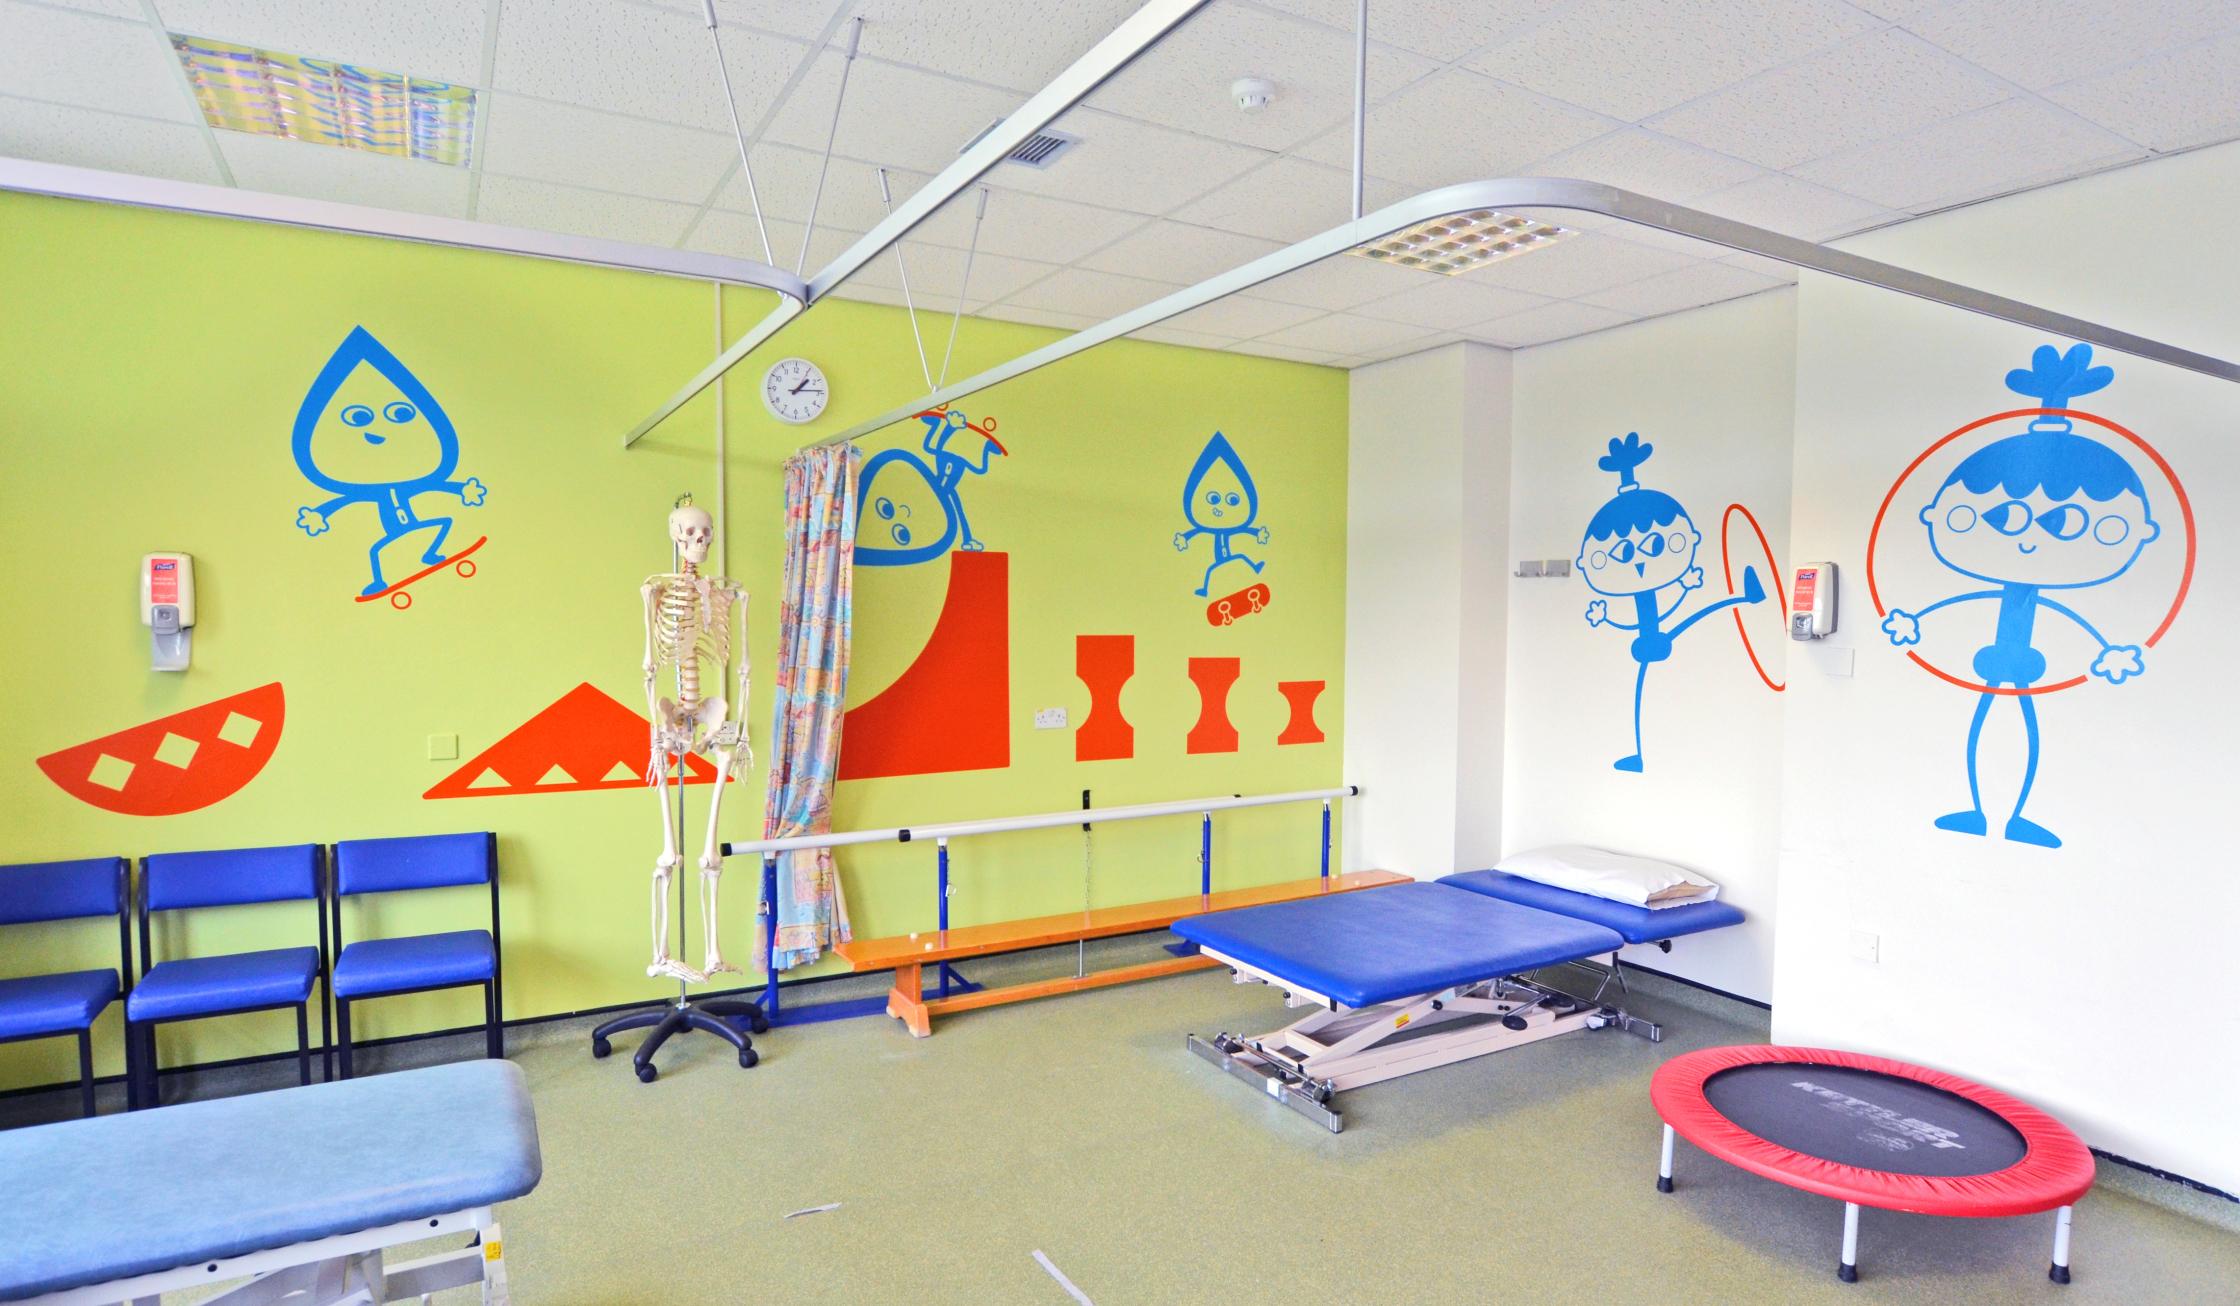 Sheffield Childrens Hospital Physio Gym 1